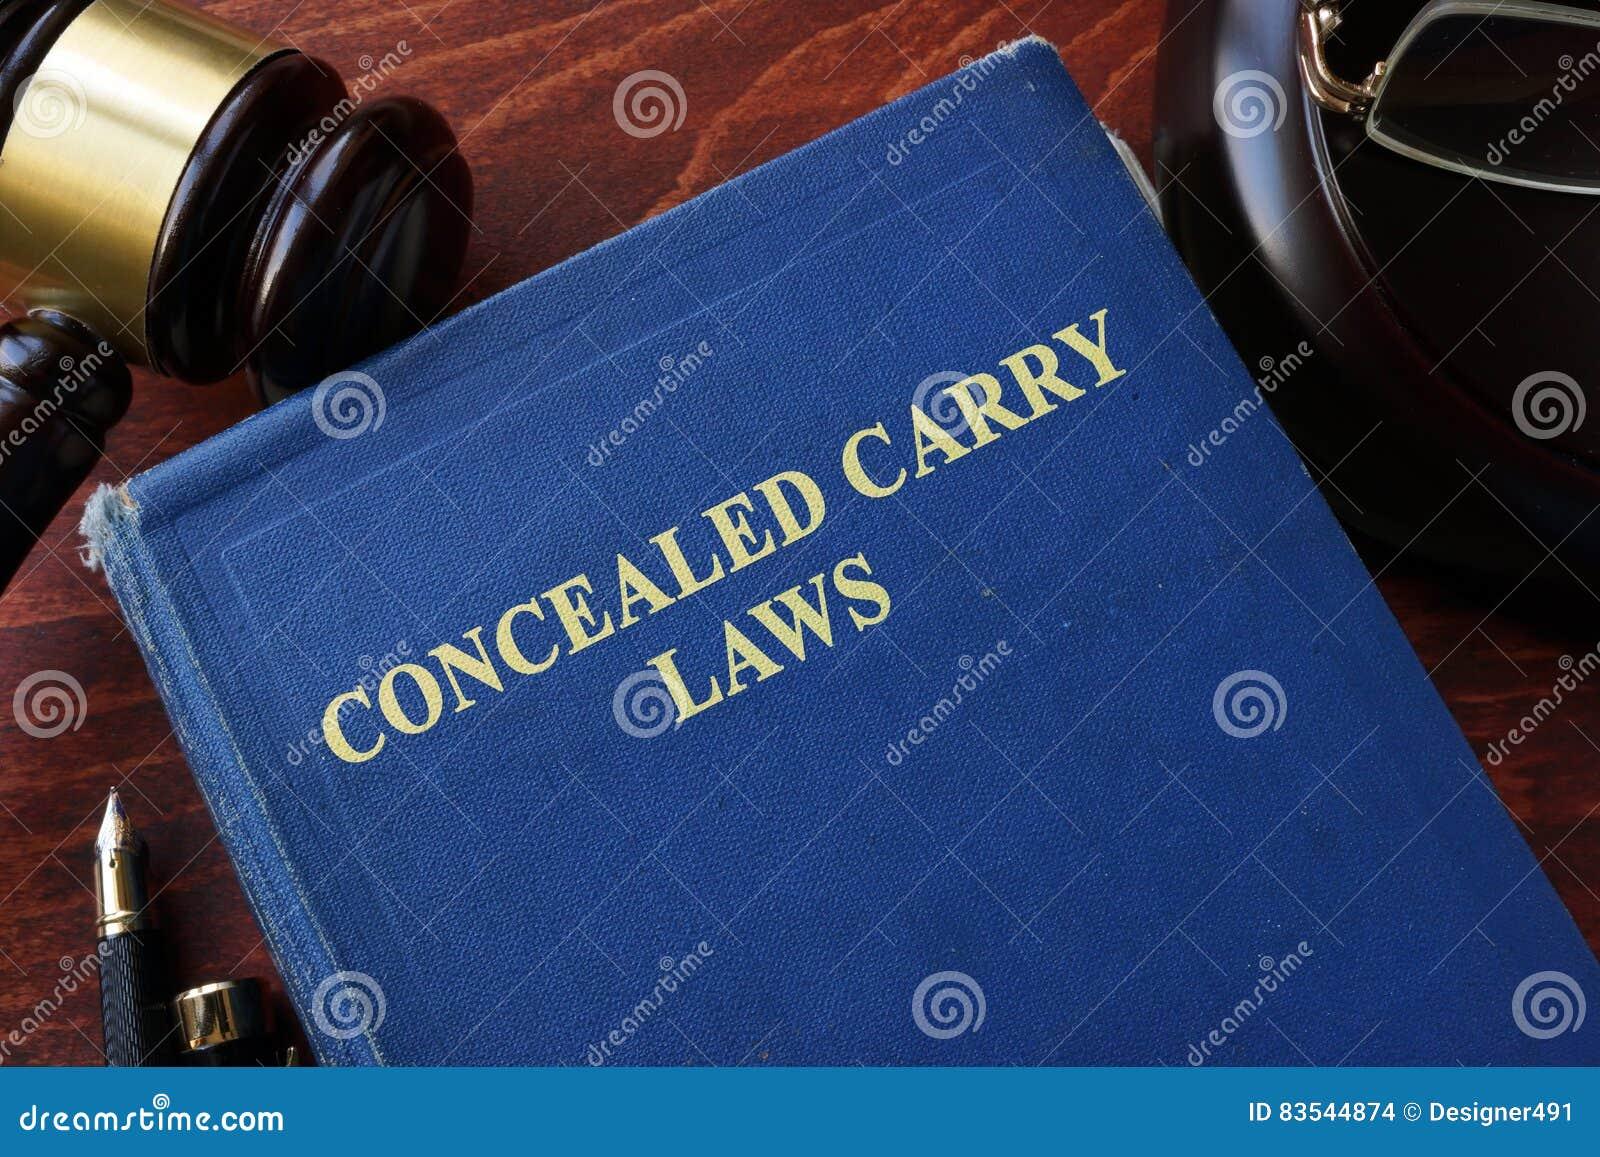 Carry Laws caché